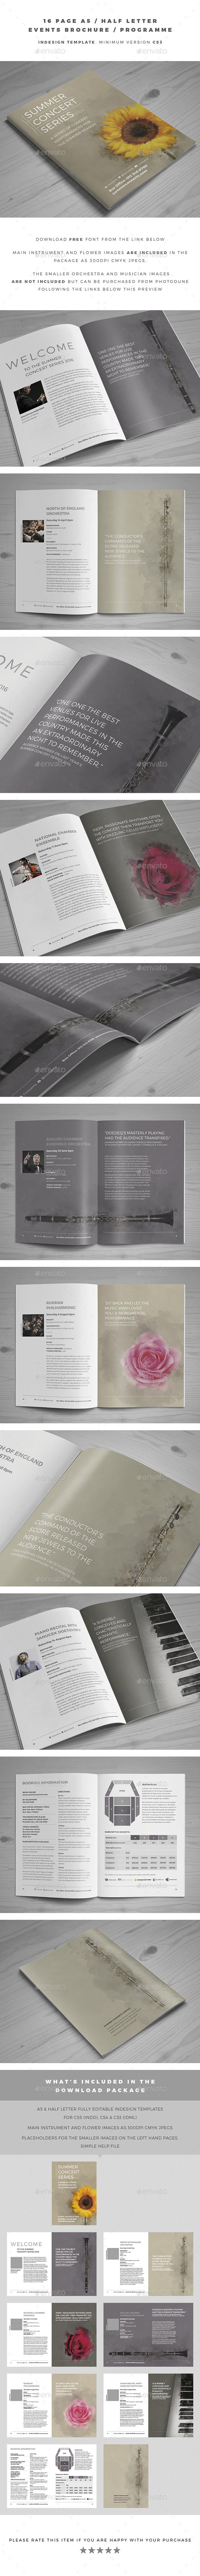 A5 / Half Letter Events Brochure / Programme - Brochures Print Templates